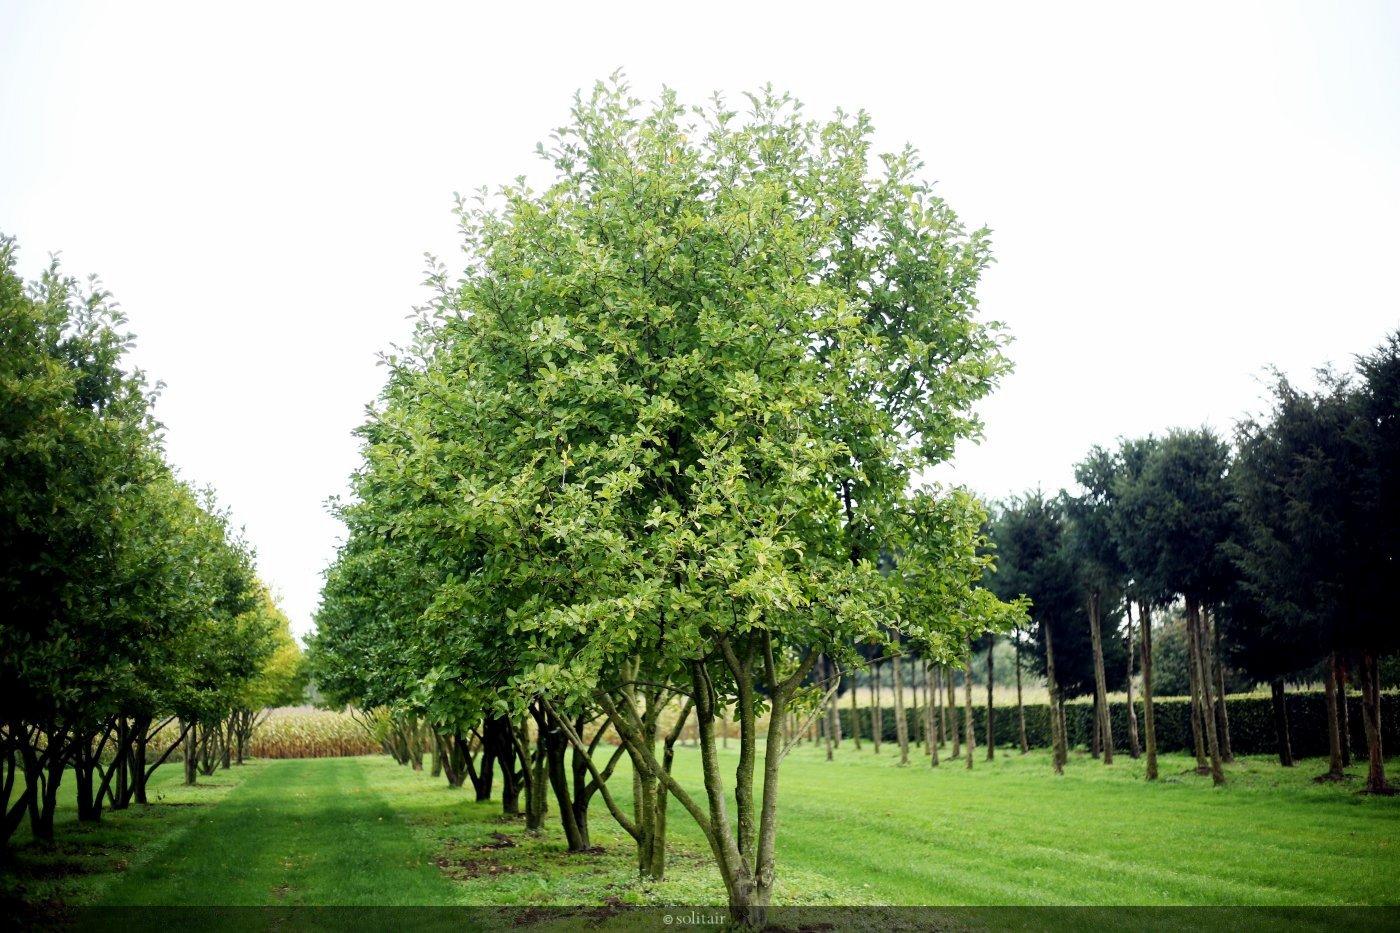 Magnolia loebneri 'Merrill' meerstam